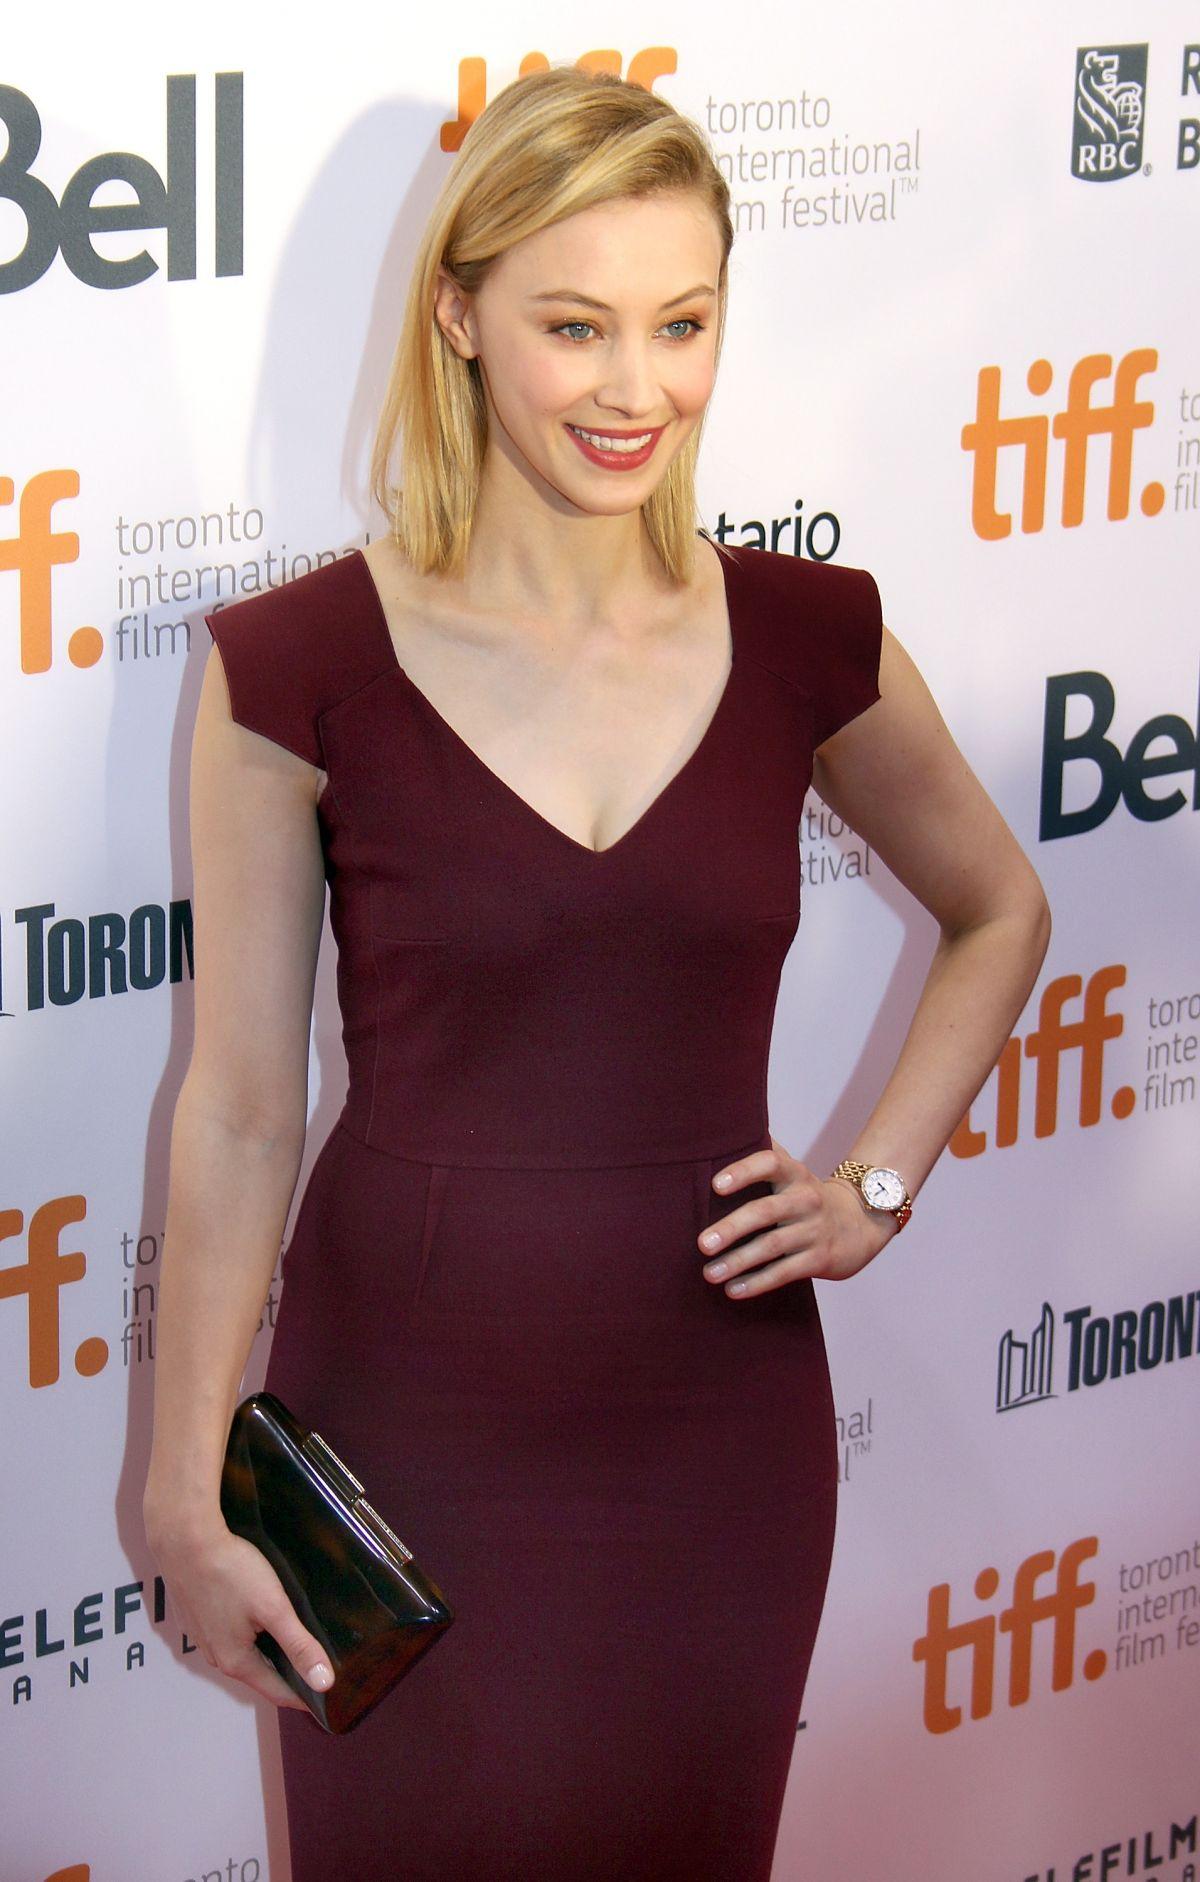 SARAH GADON at Toronto International Film Festival 2014